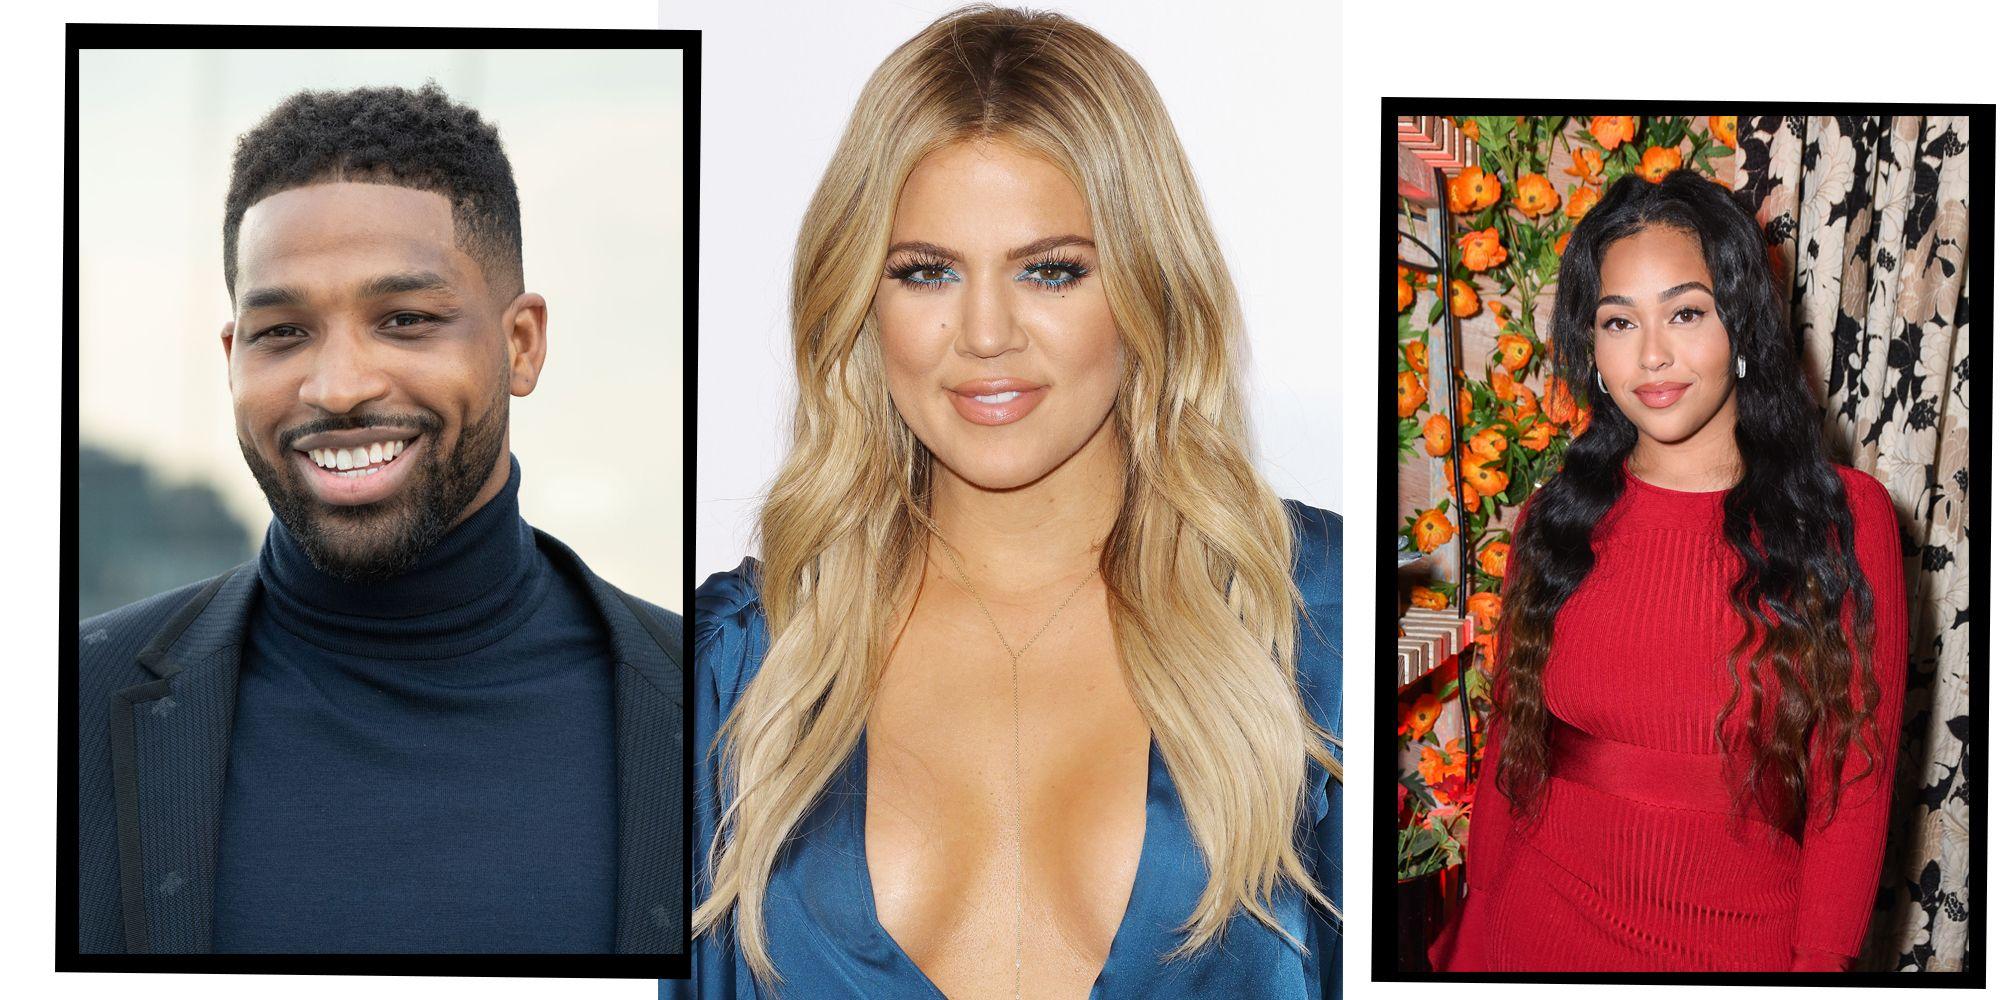 Khloé Kardashian Posts Emotional Statement About Forgiving Jordyn Woods And Tristan Thompson